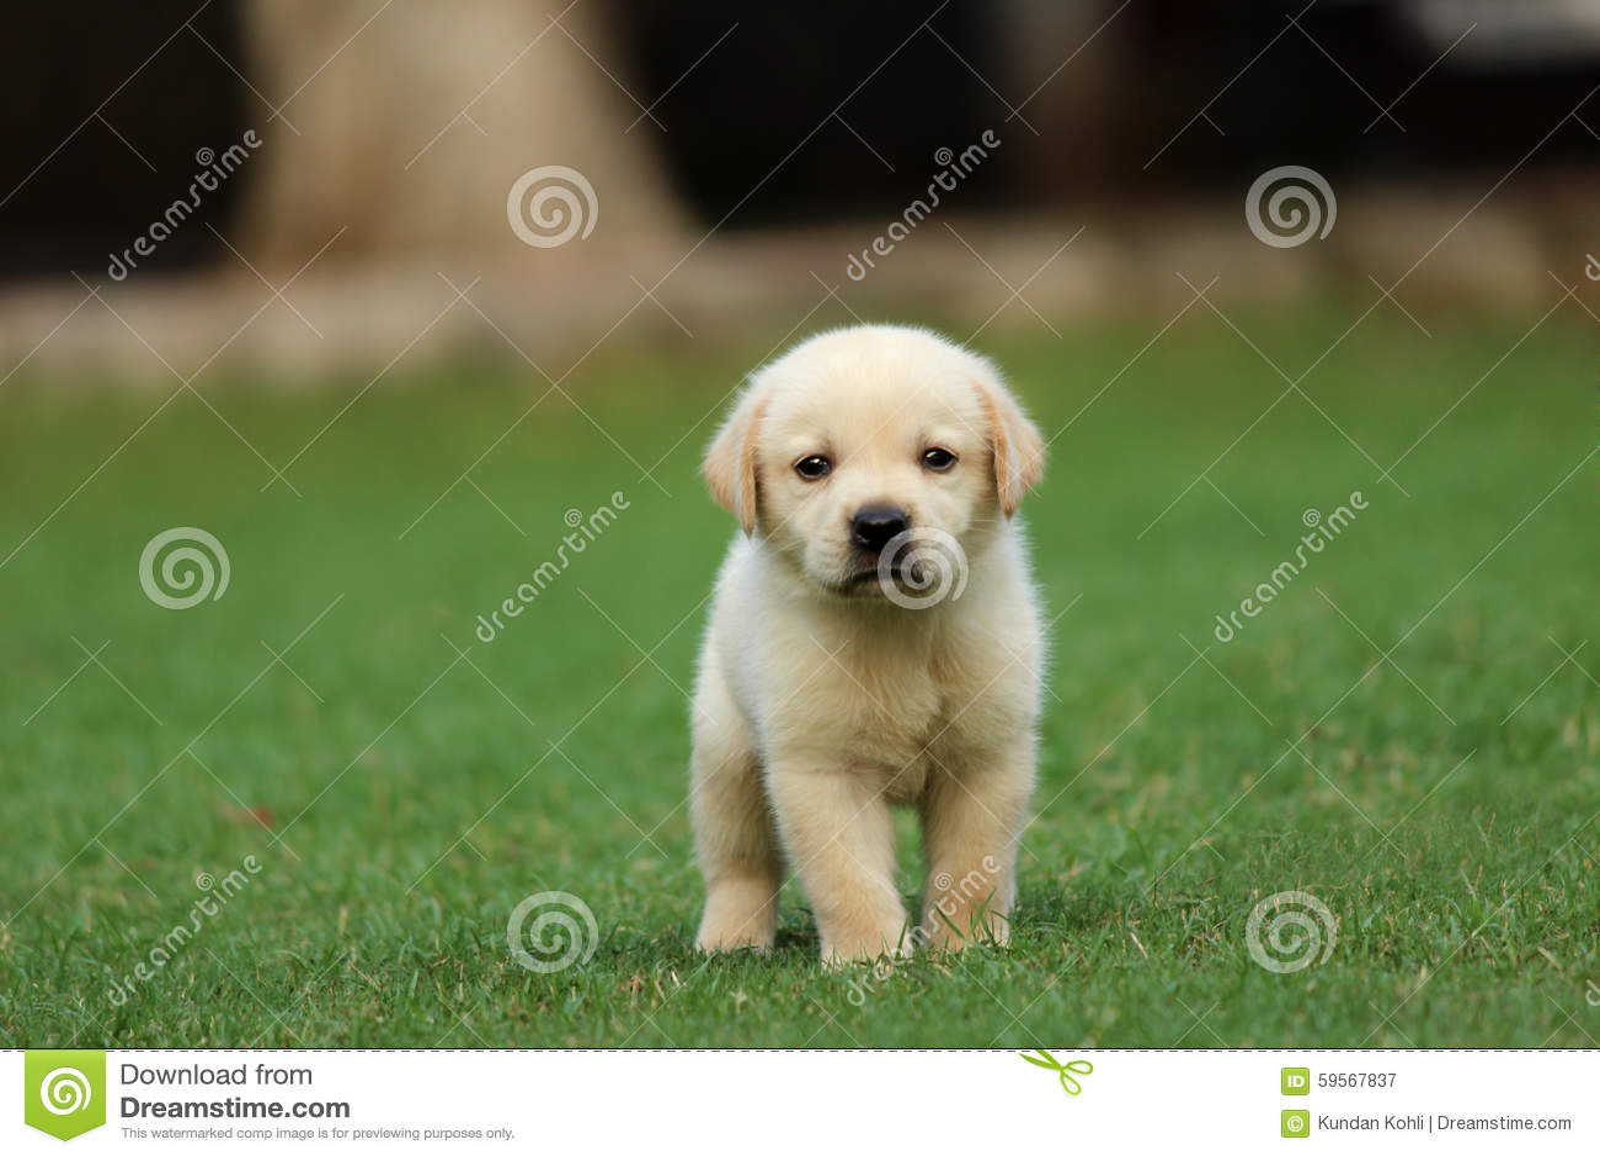 Labrador Puppy Wallpaper Stock Image Image Of Innocnt 59567837